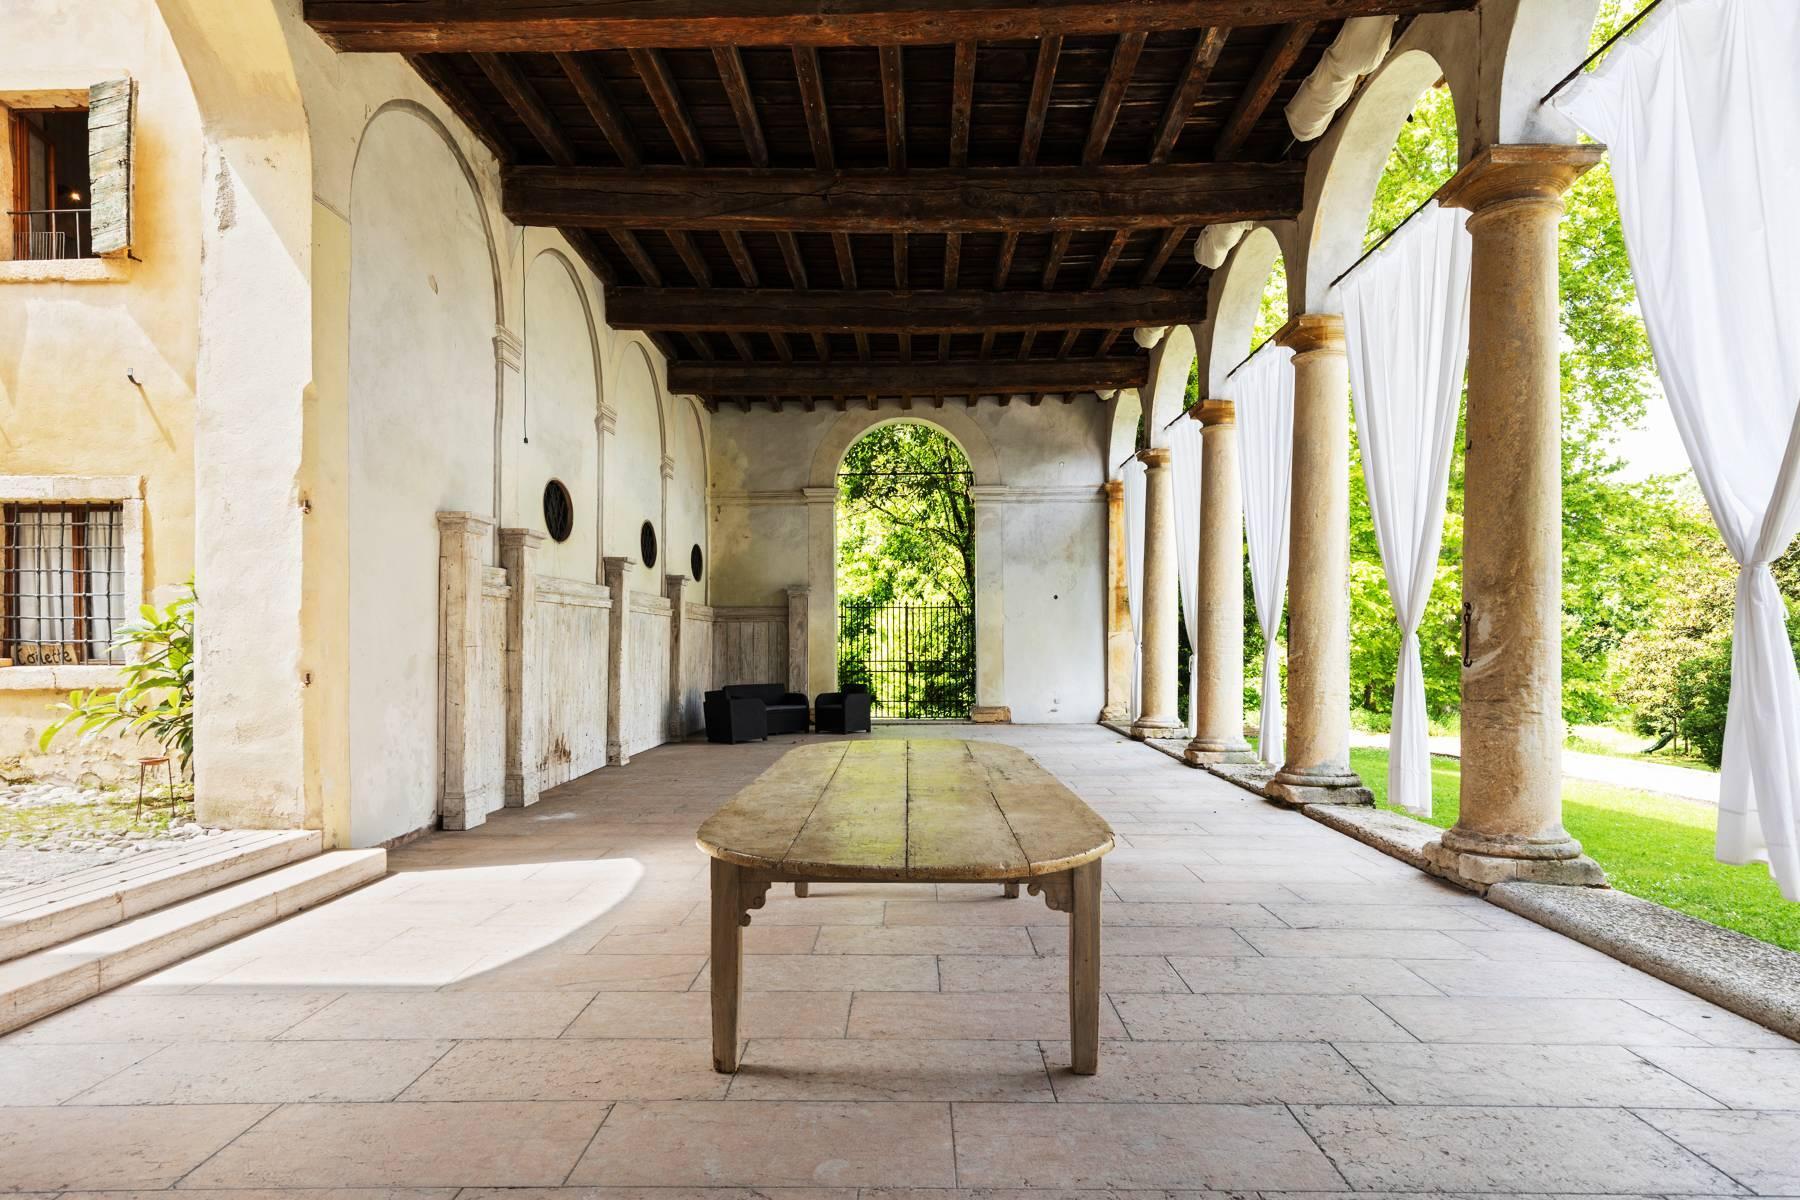 Affascinante villa Veneta a pochi minuti da Verona - 13